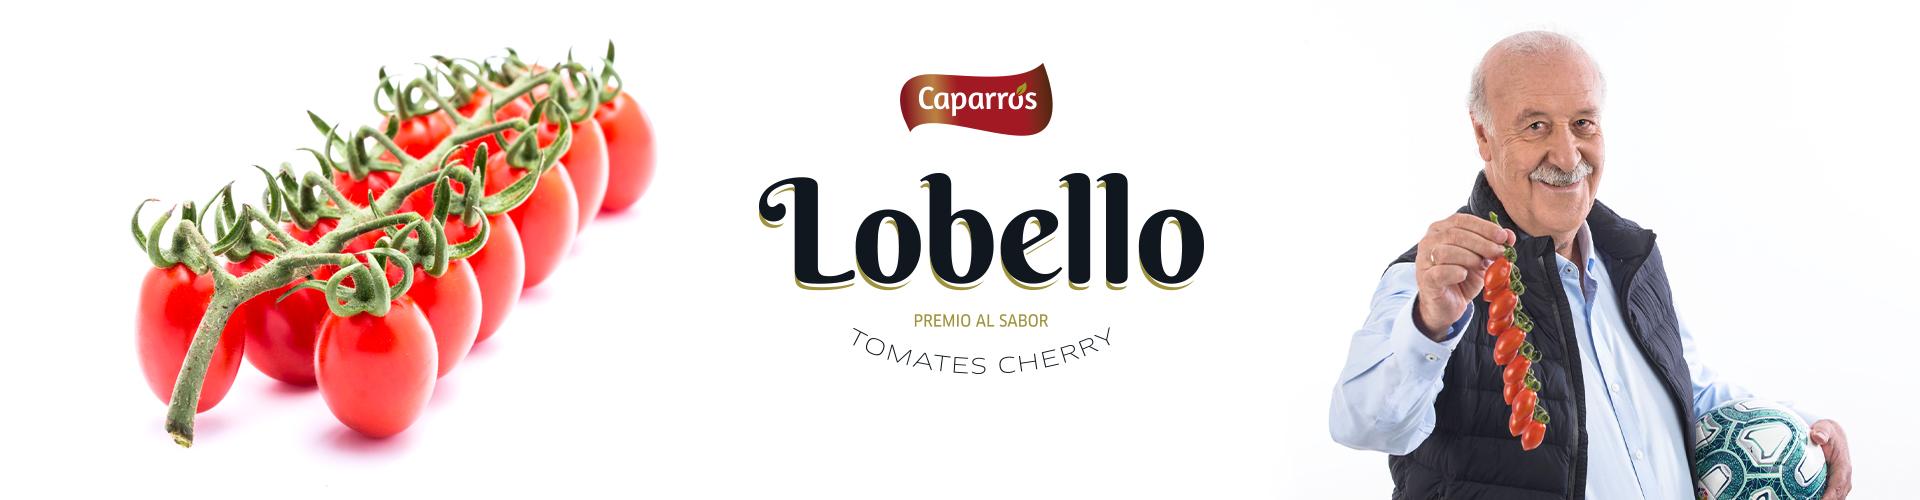 Tomate cherry Lobello - Caparrós